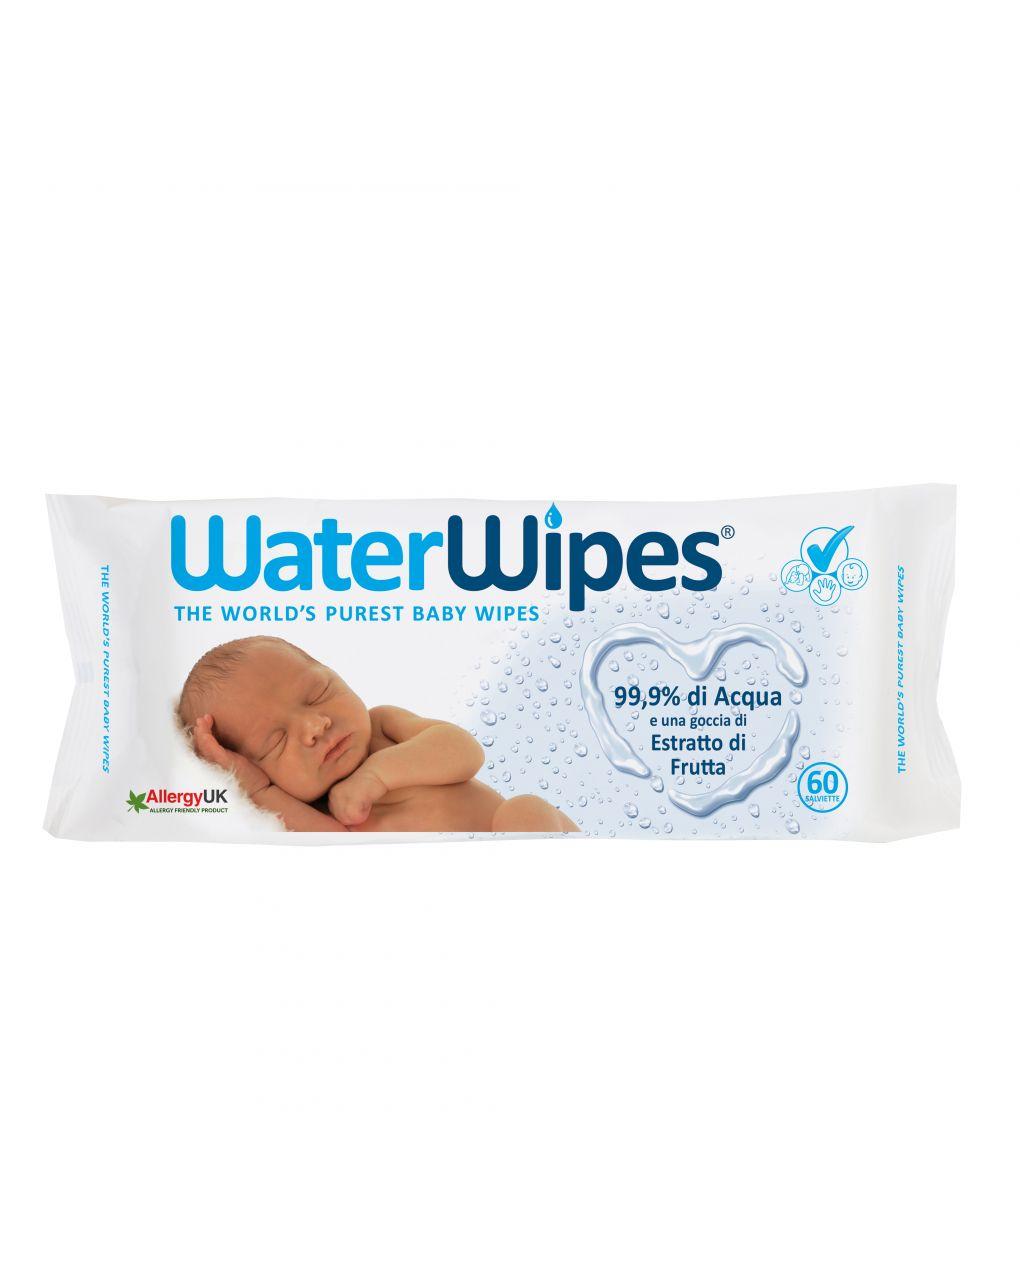 Water wipes salviette 60pz - WaterWipes